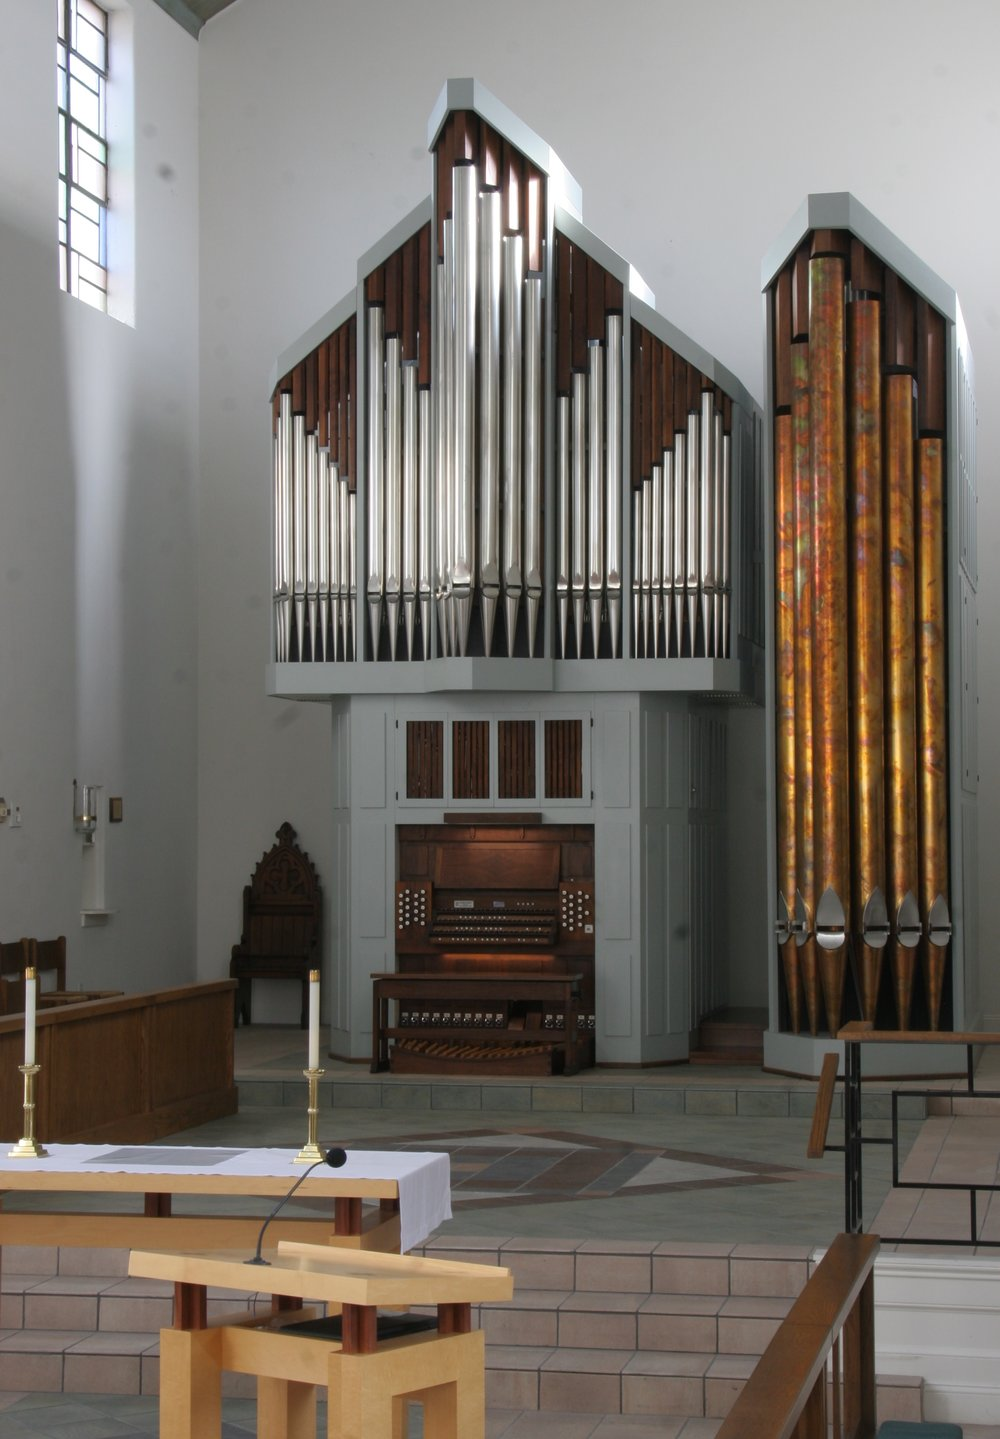 Holy Trinity Episcopal Church, Oxford Ohio